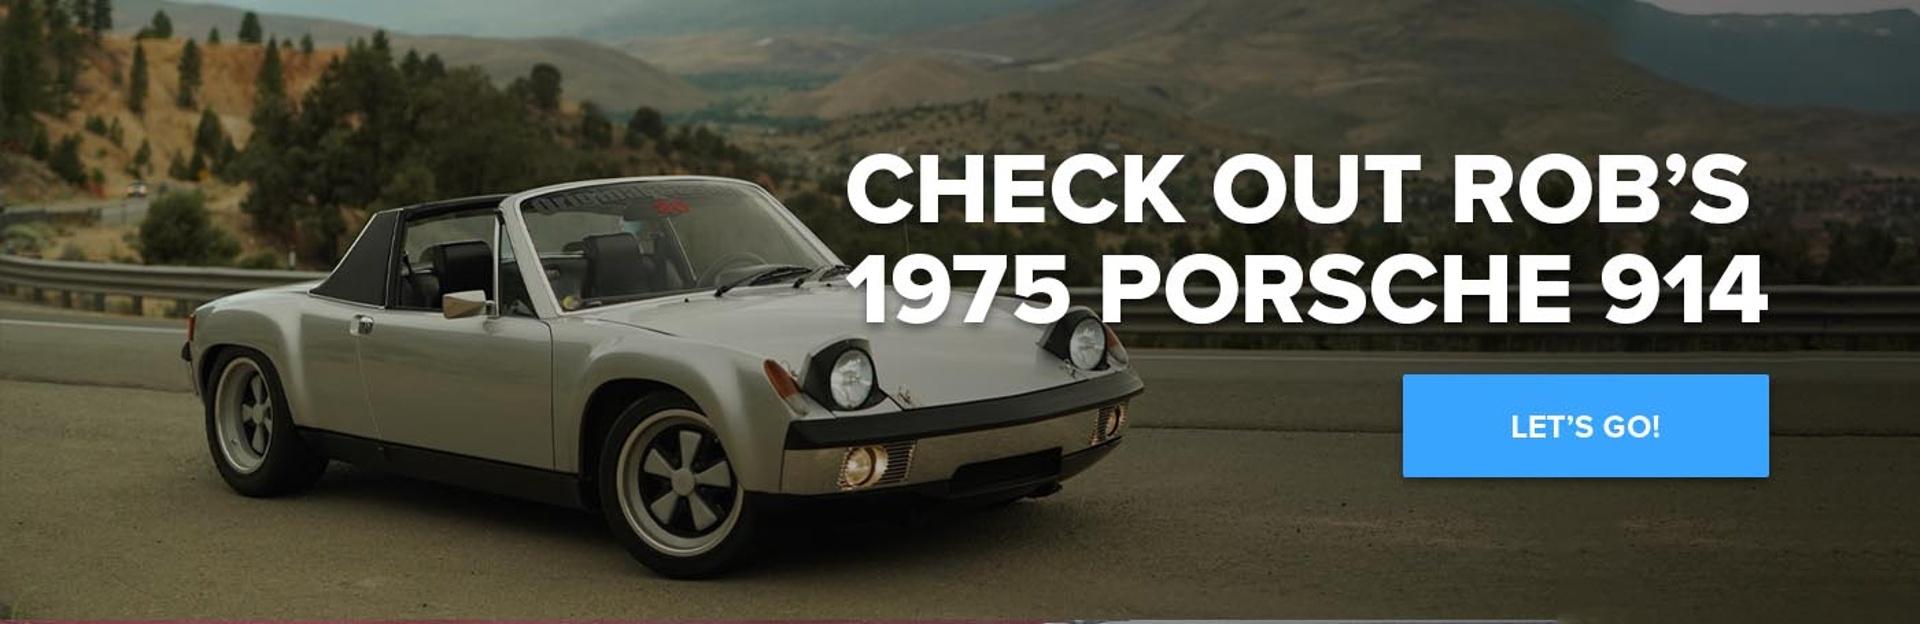 Read About Rob's 1975 Porsche 914